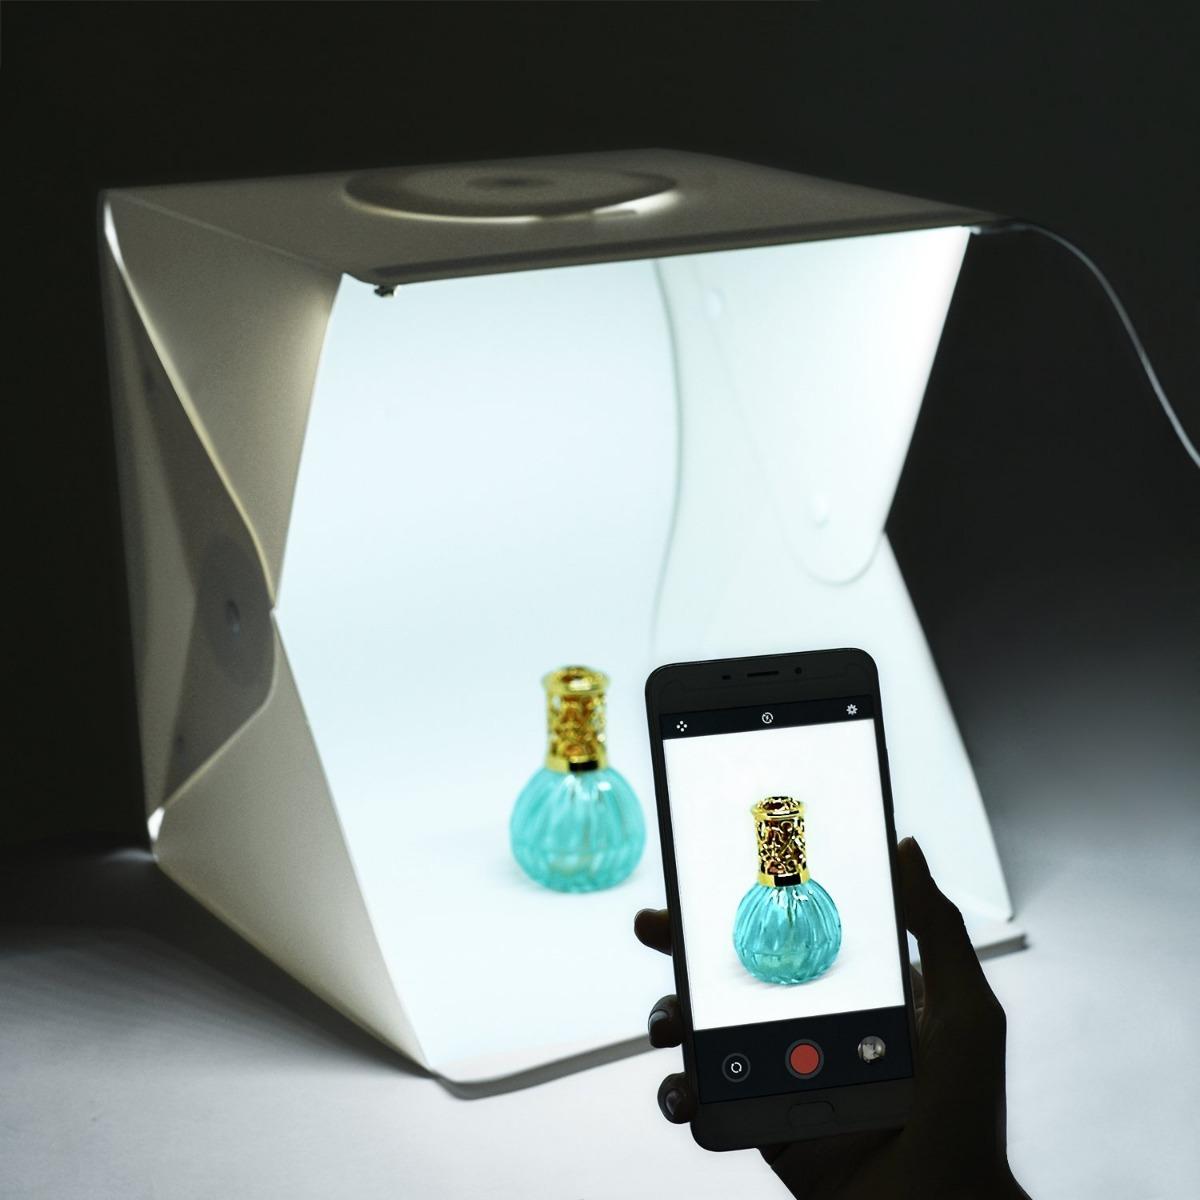 Caja Fotografica Portable Zenic Iluminacion Led Fotografia ...